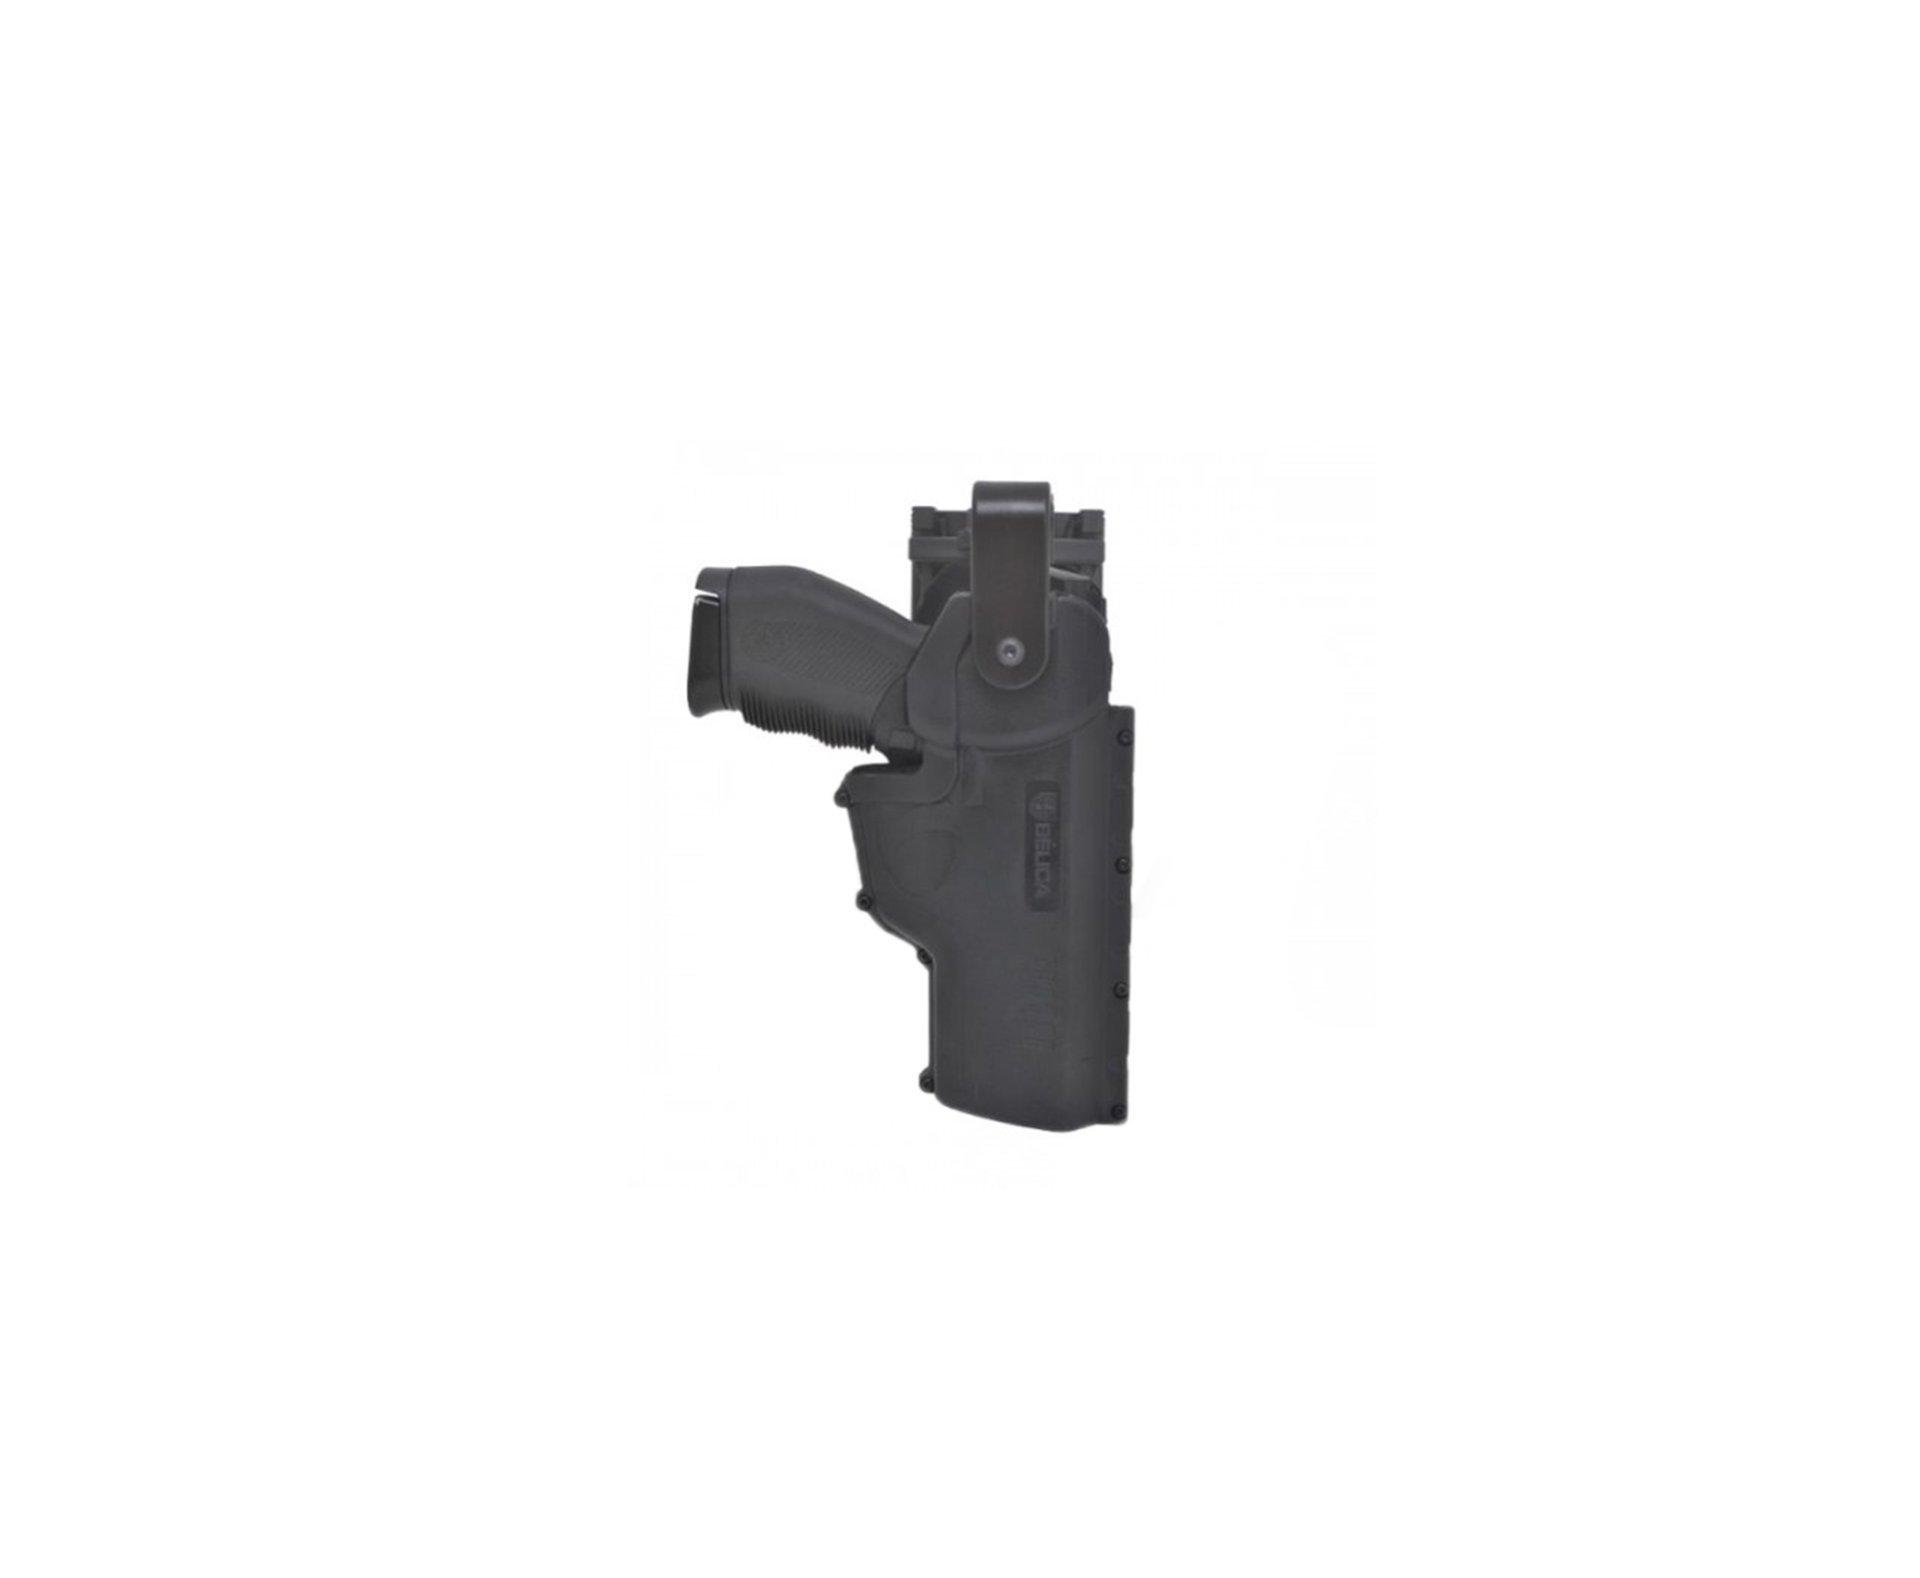 Coldre Hammer De Cintura Glock, 24/7, Taurus Diversas - Polimero - Canhoto- Belica